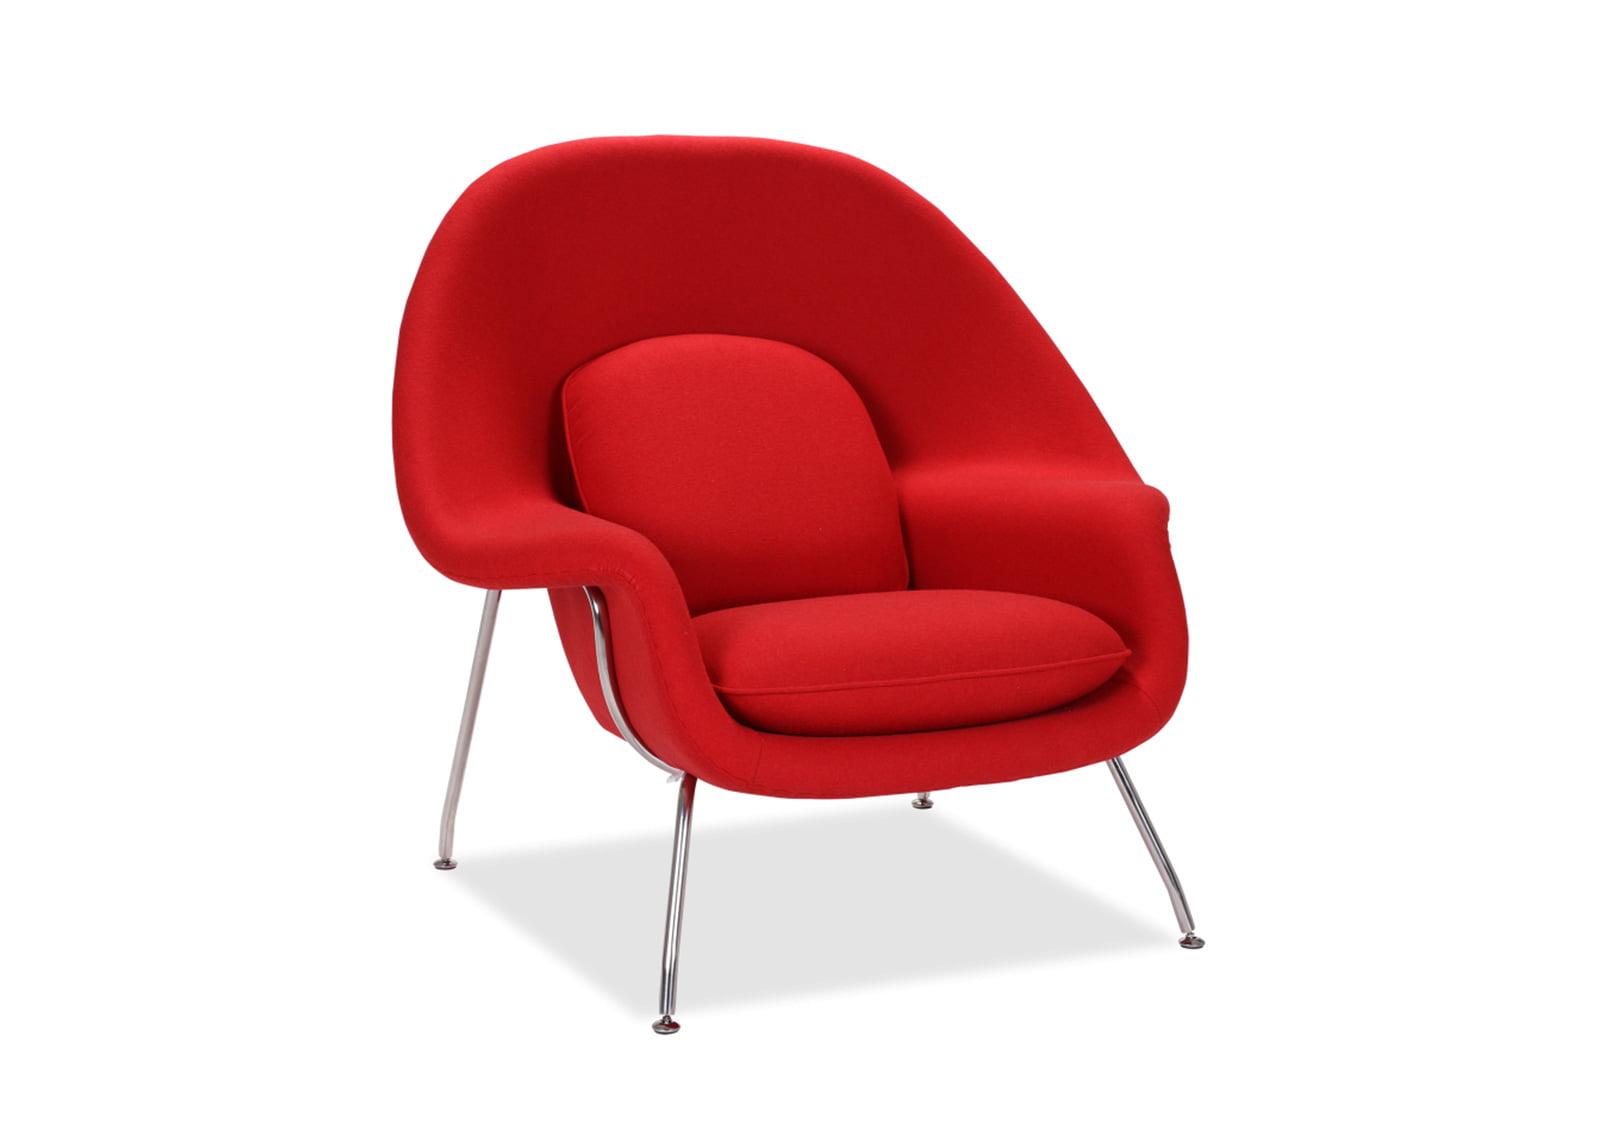 modern red chair cover rental austin tx womb & ottoman | furnishplus